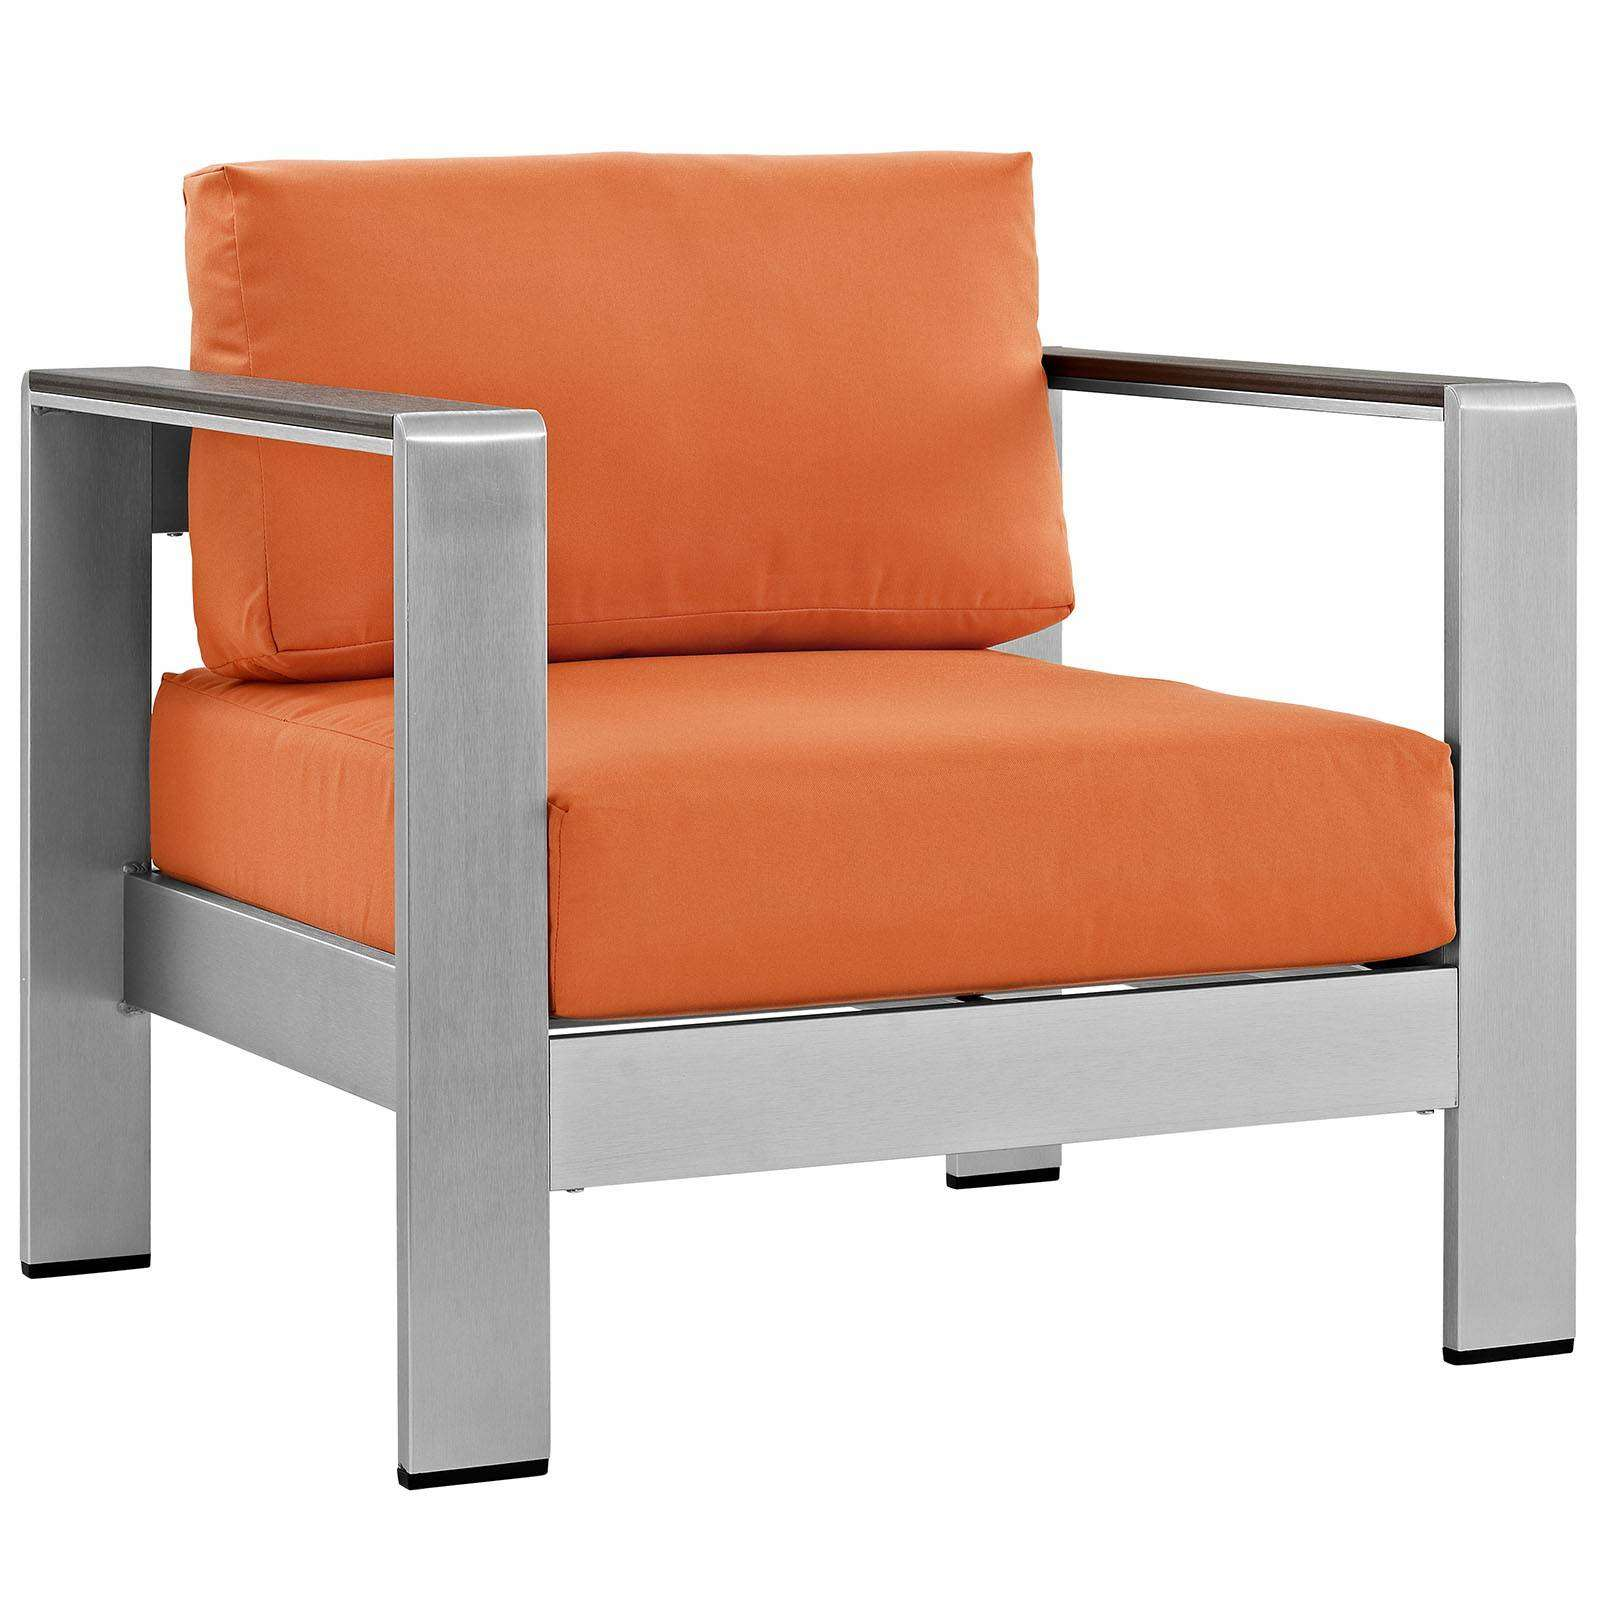 Modterior Outdoor Outdoor Chairs Shore Outdoor Patio